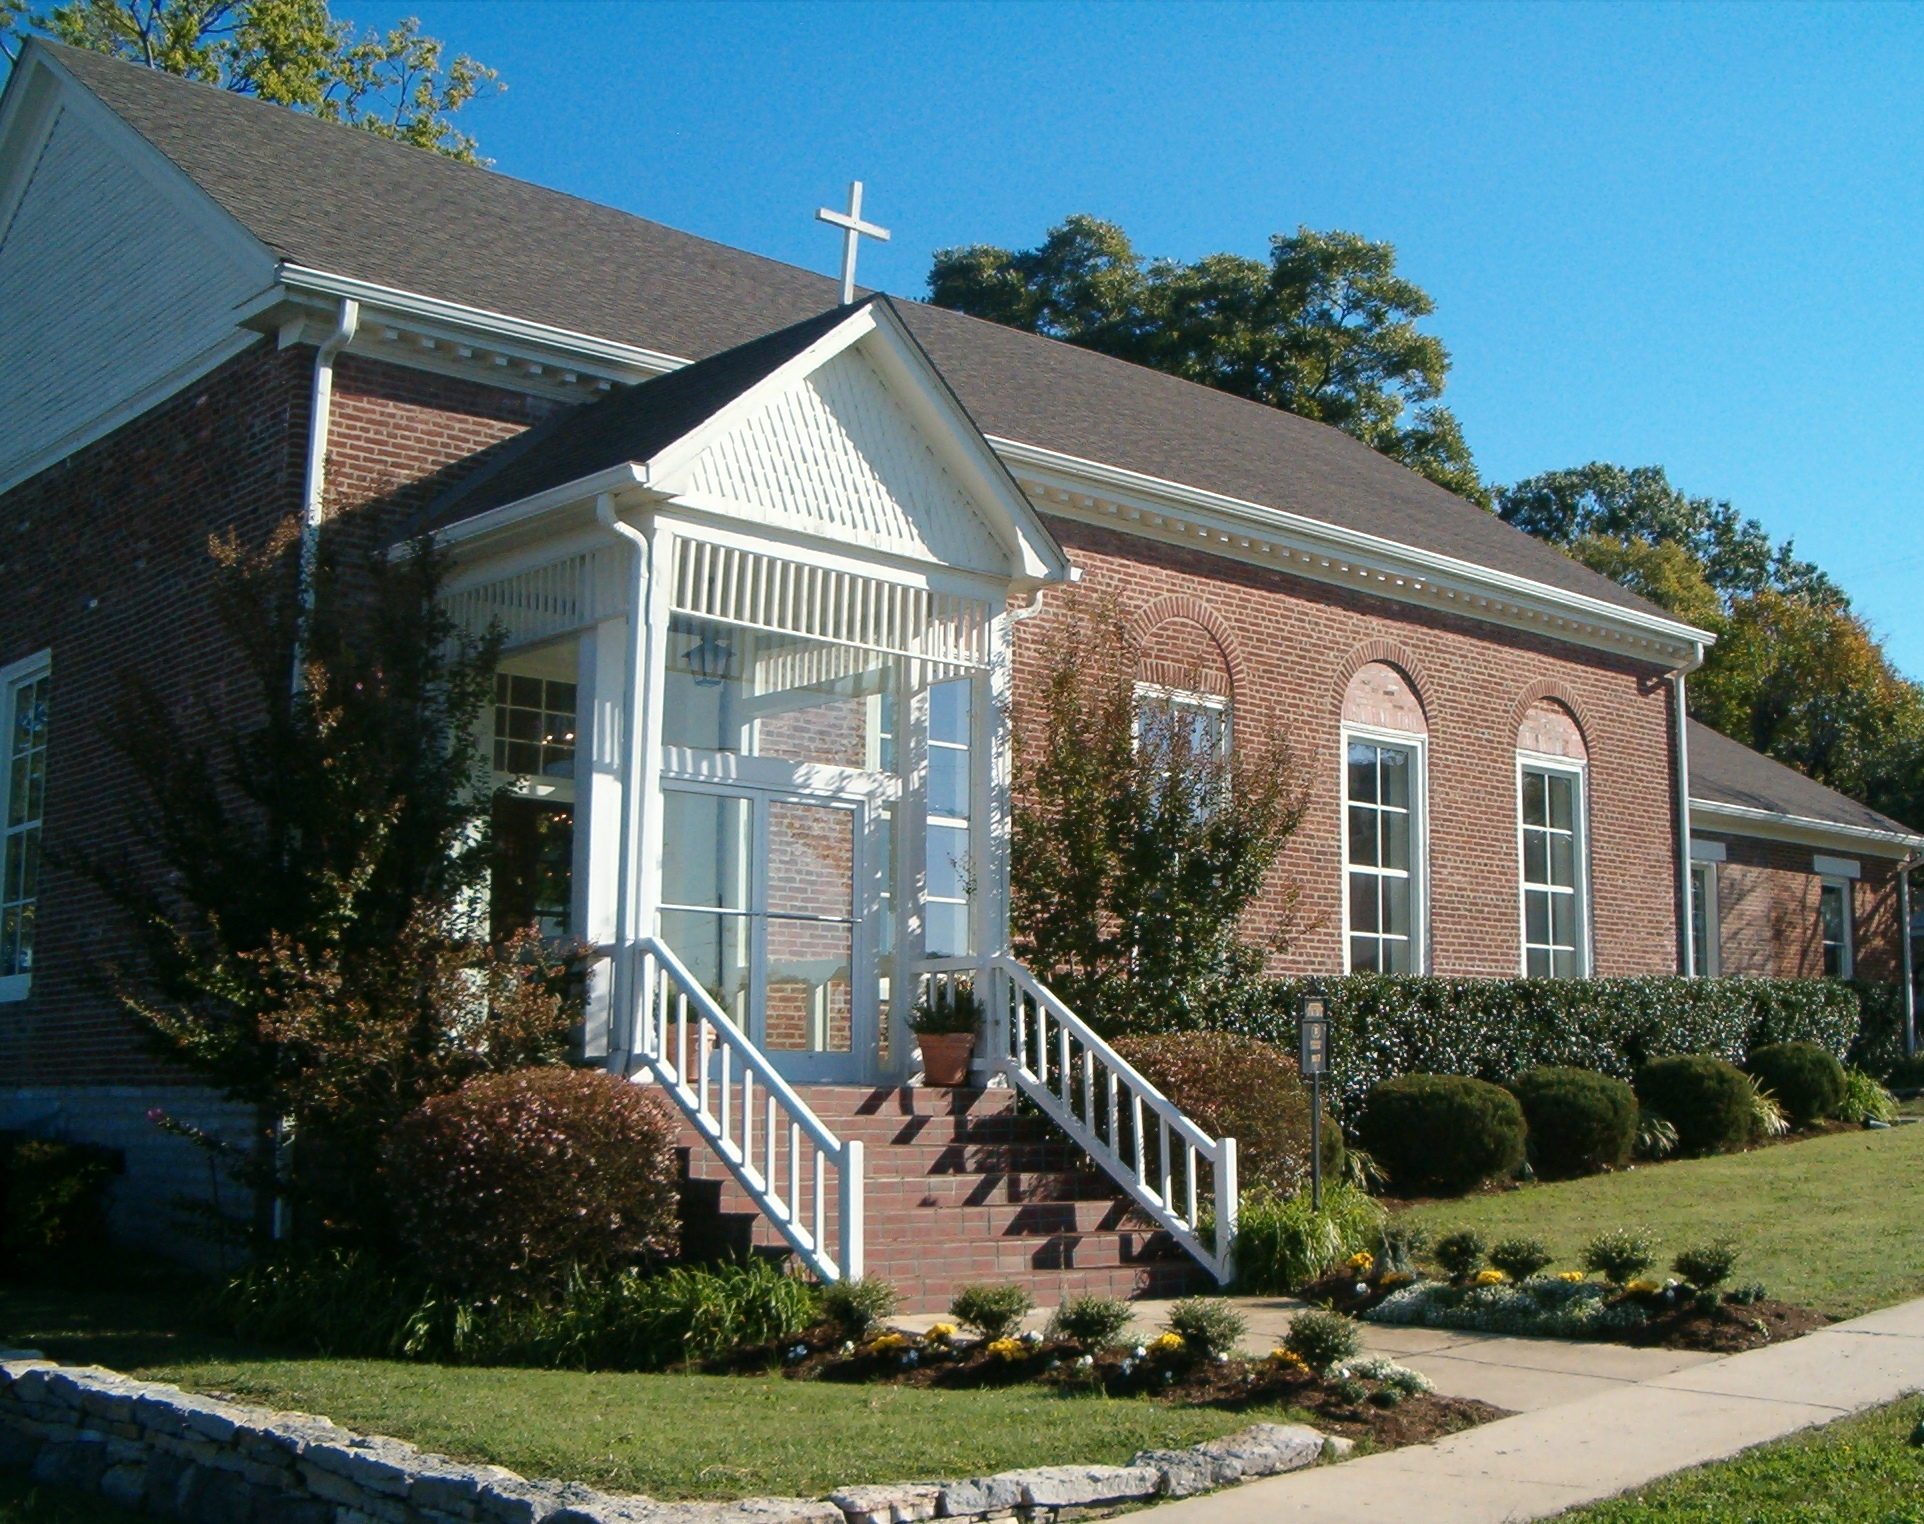 The episcopal church of redeemer photo